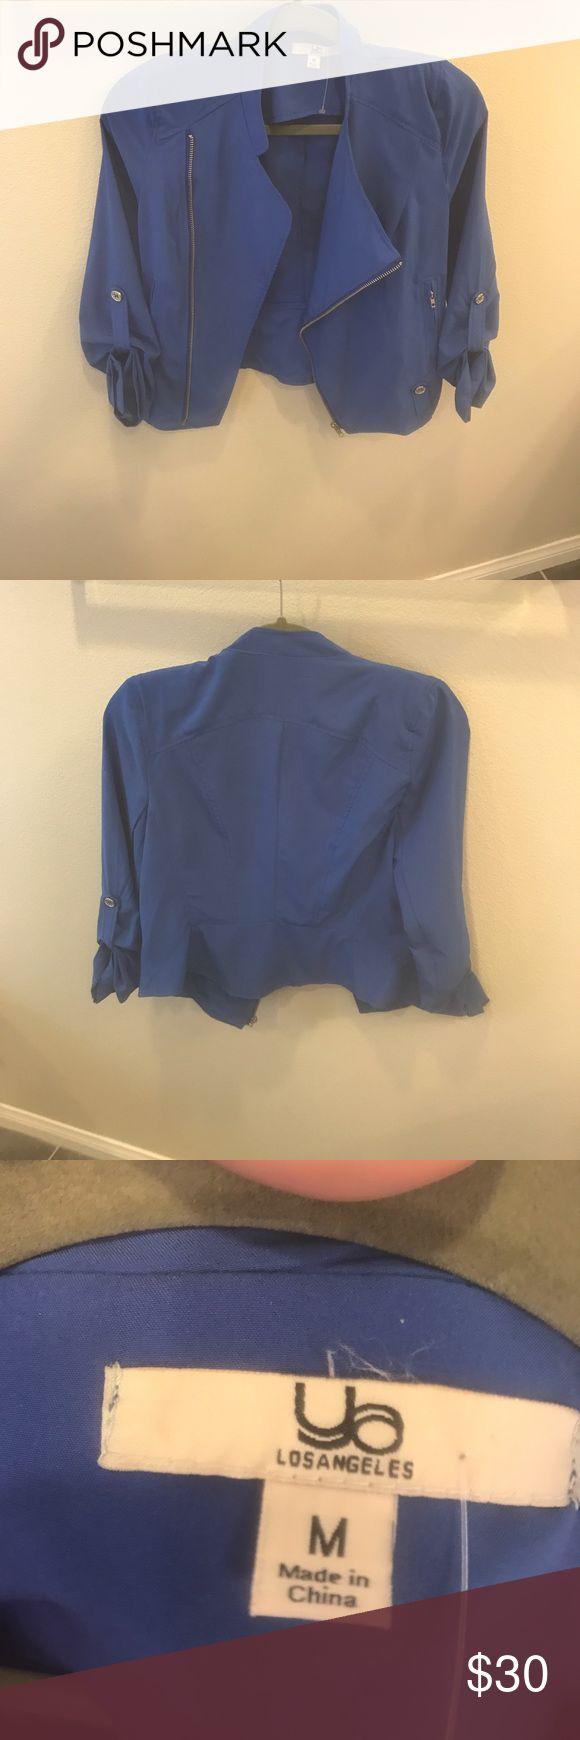 Royal Blue Motorcycle Jacket Royal Blue Motor Cycle Jacket. Asymmetrical front zipper. Jackets & Coats Blazers